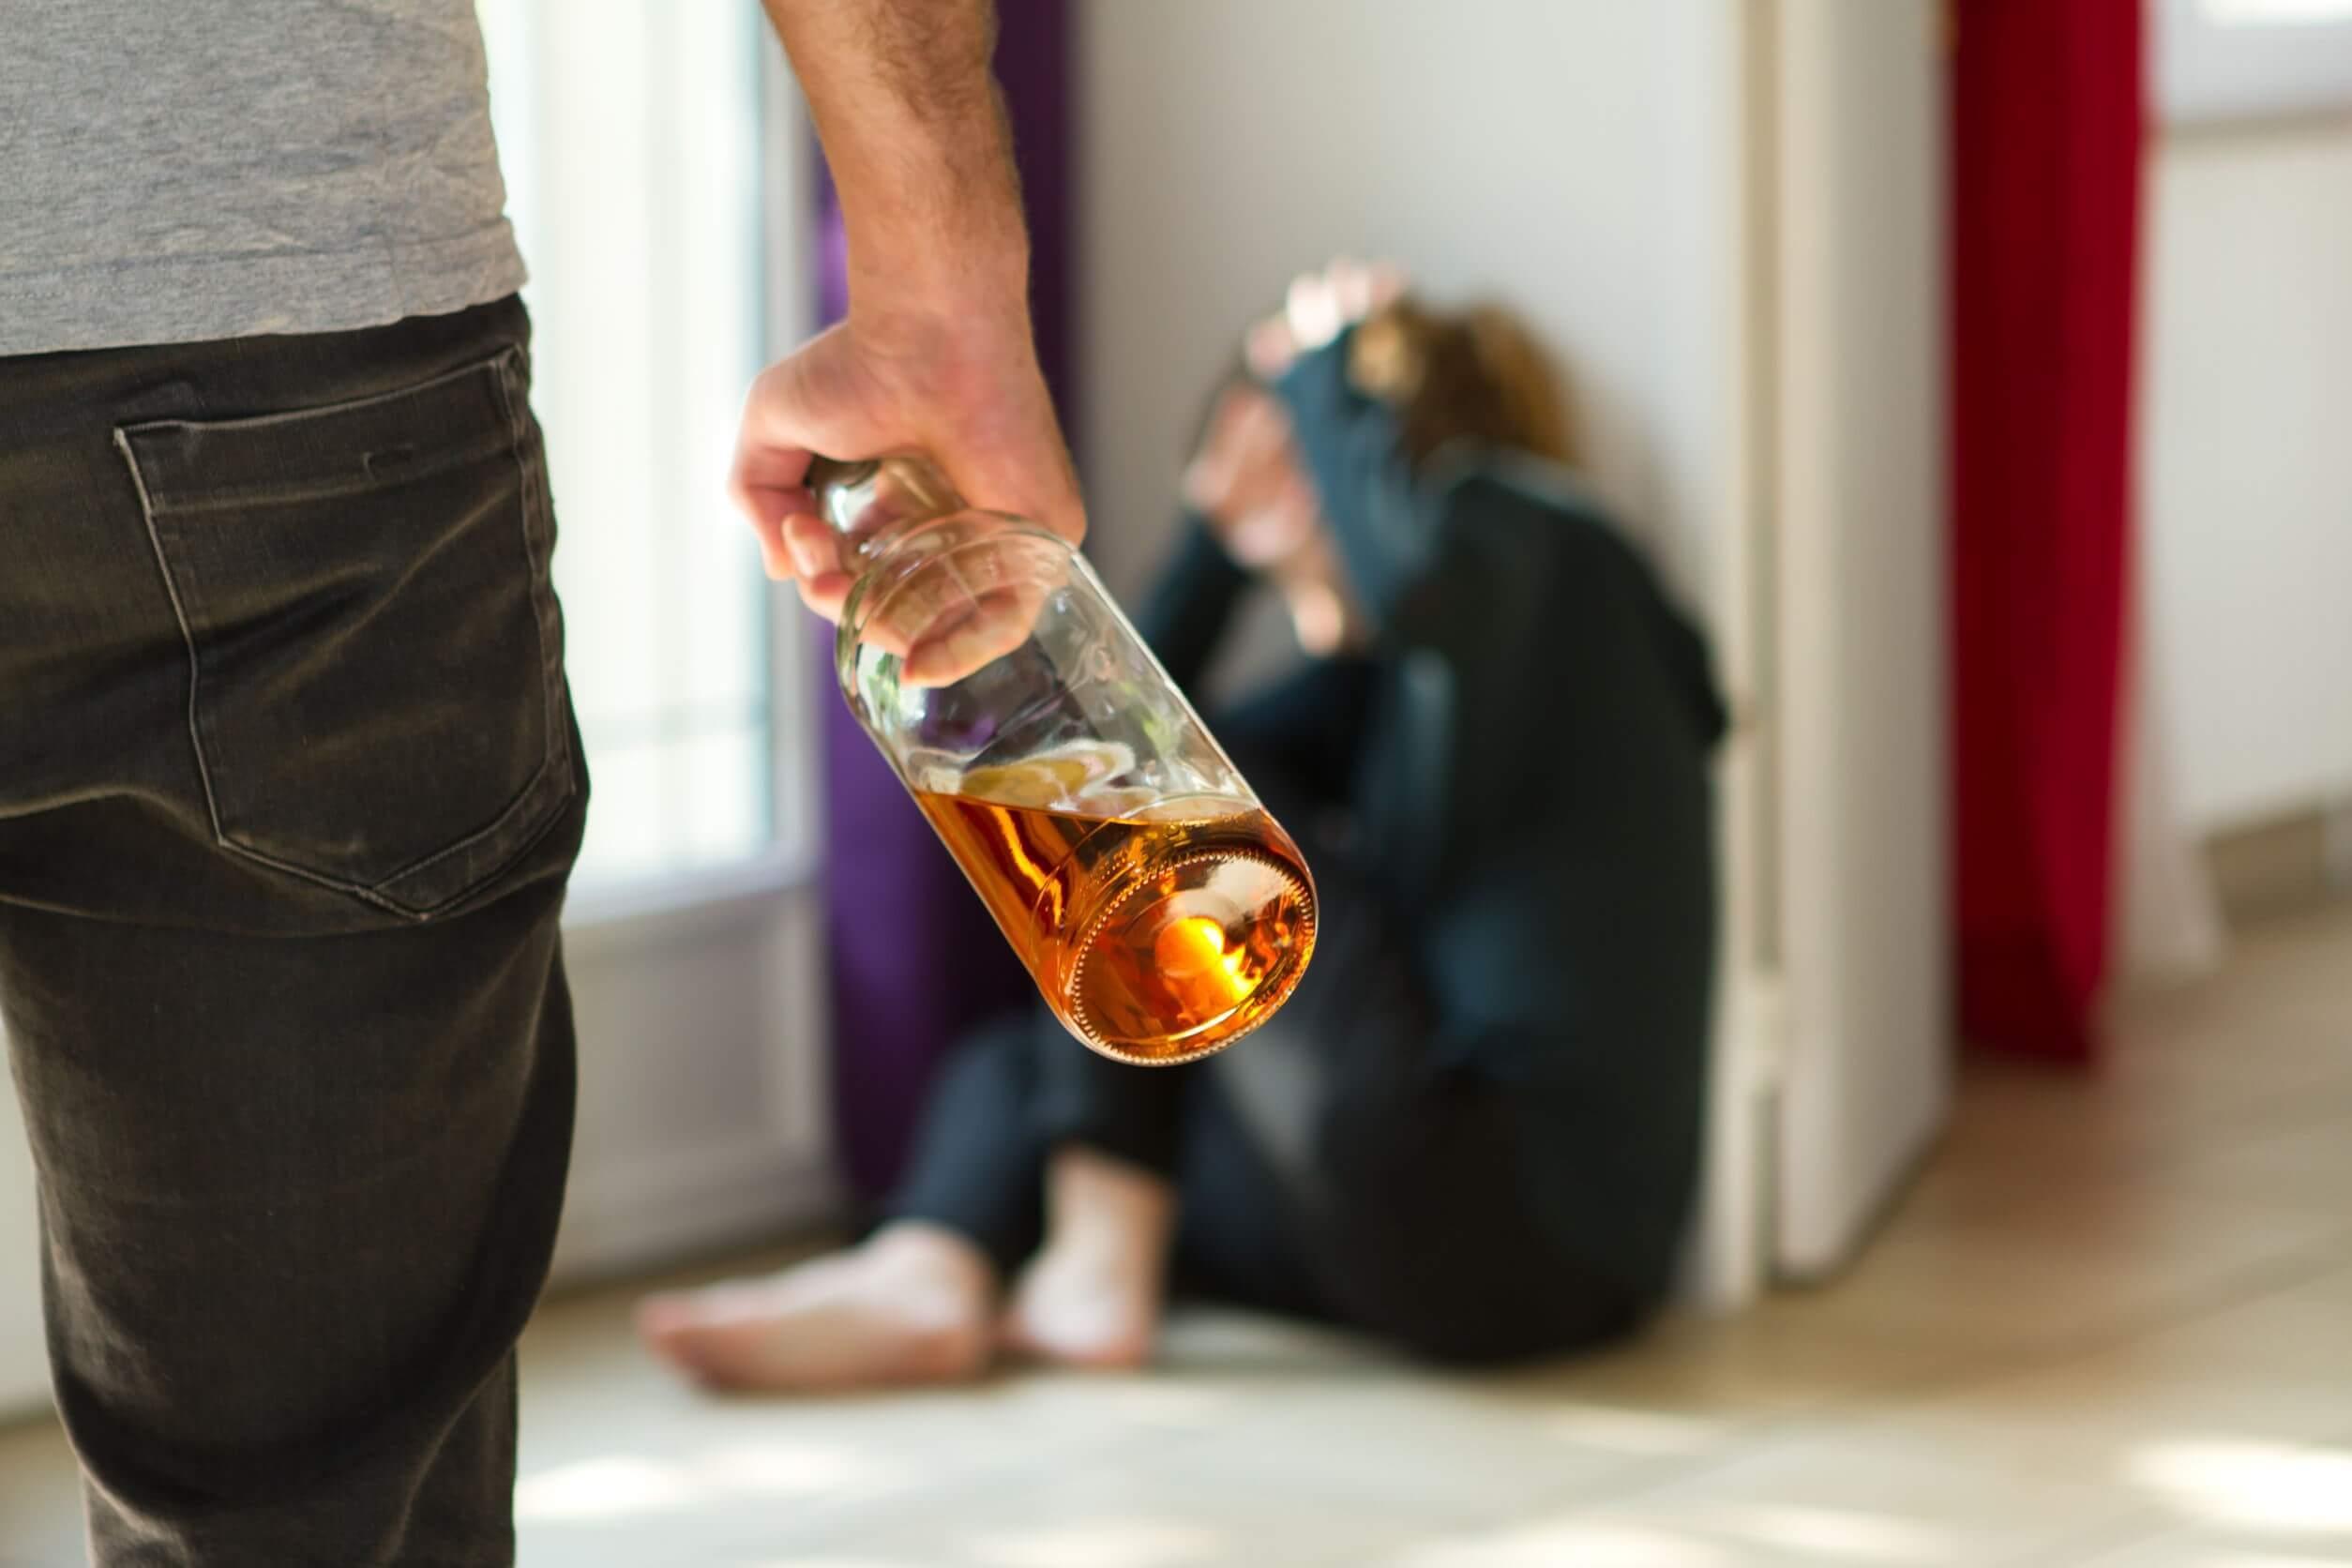 Как проучить мужа за неуважение?